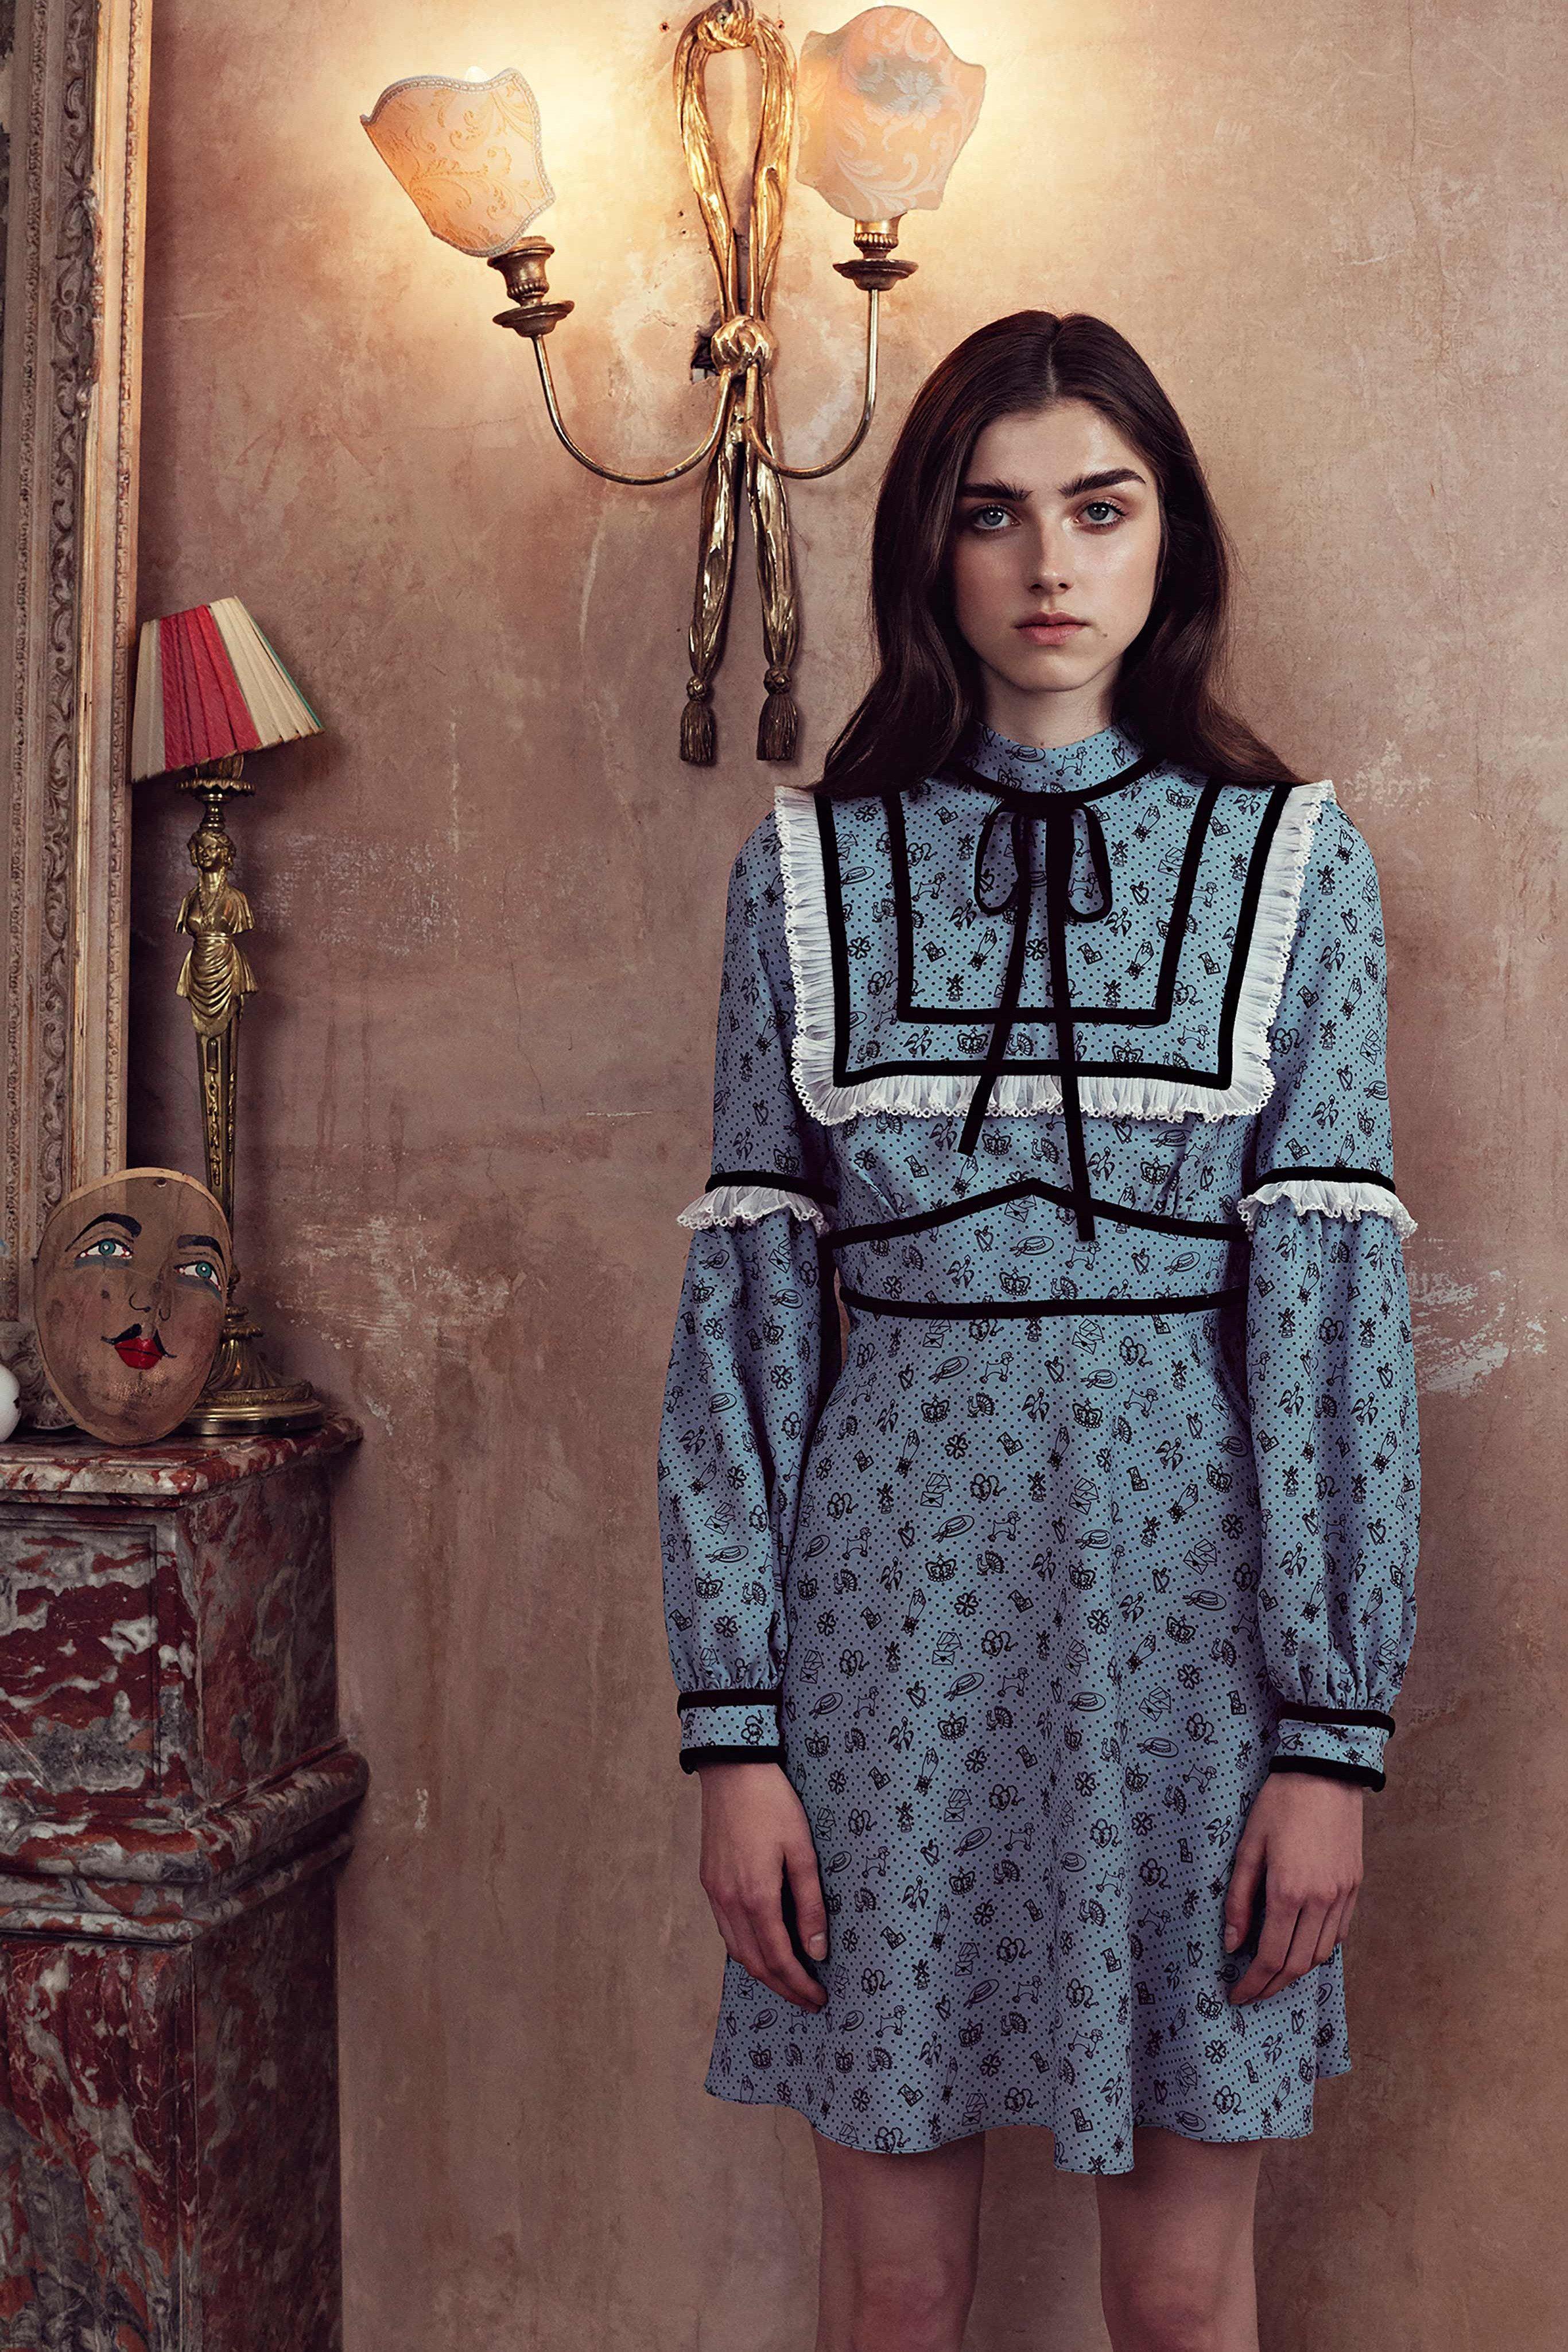 Orla Kiely SpringSummer 2019 Collection – London Fashion Week forecasting